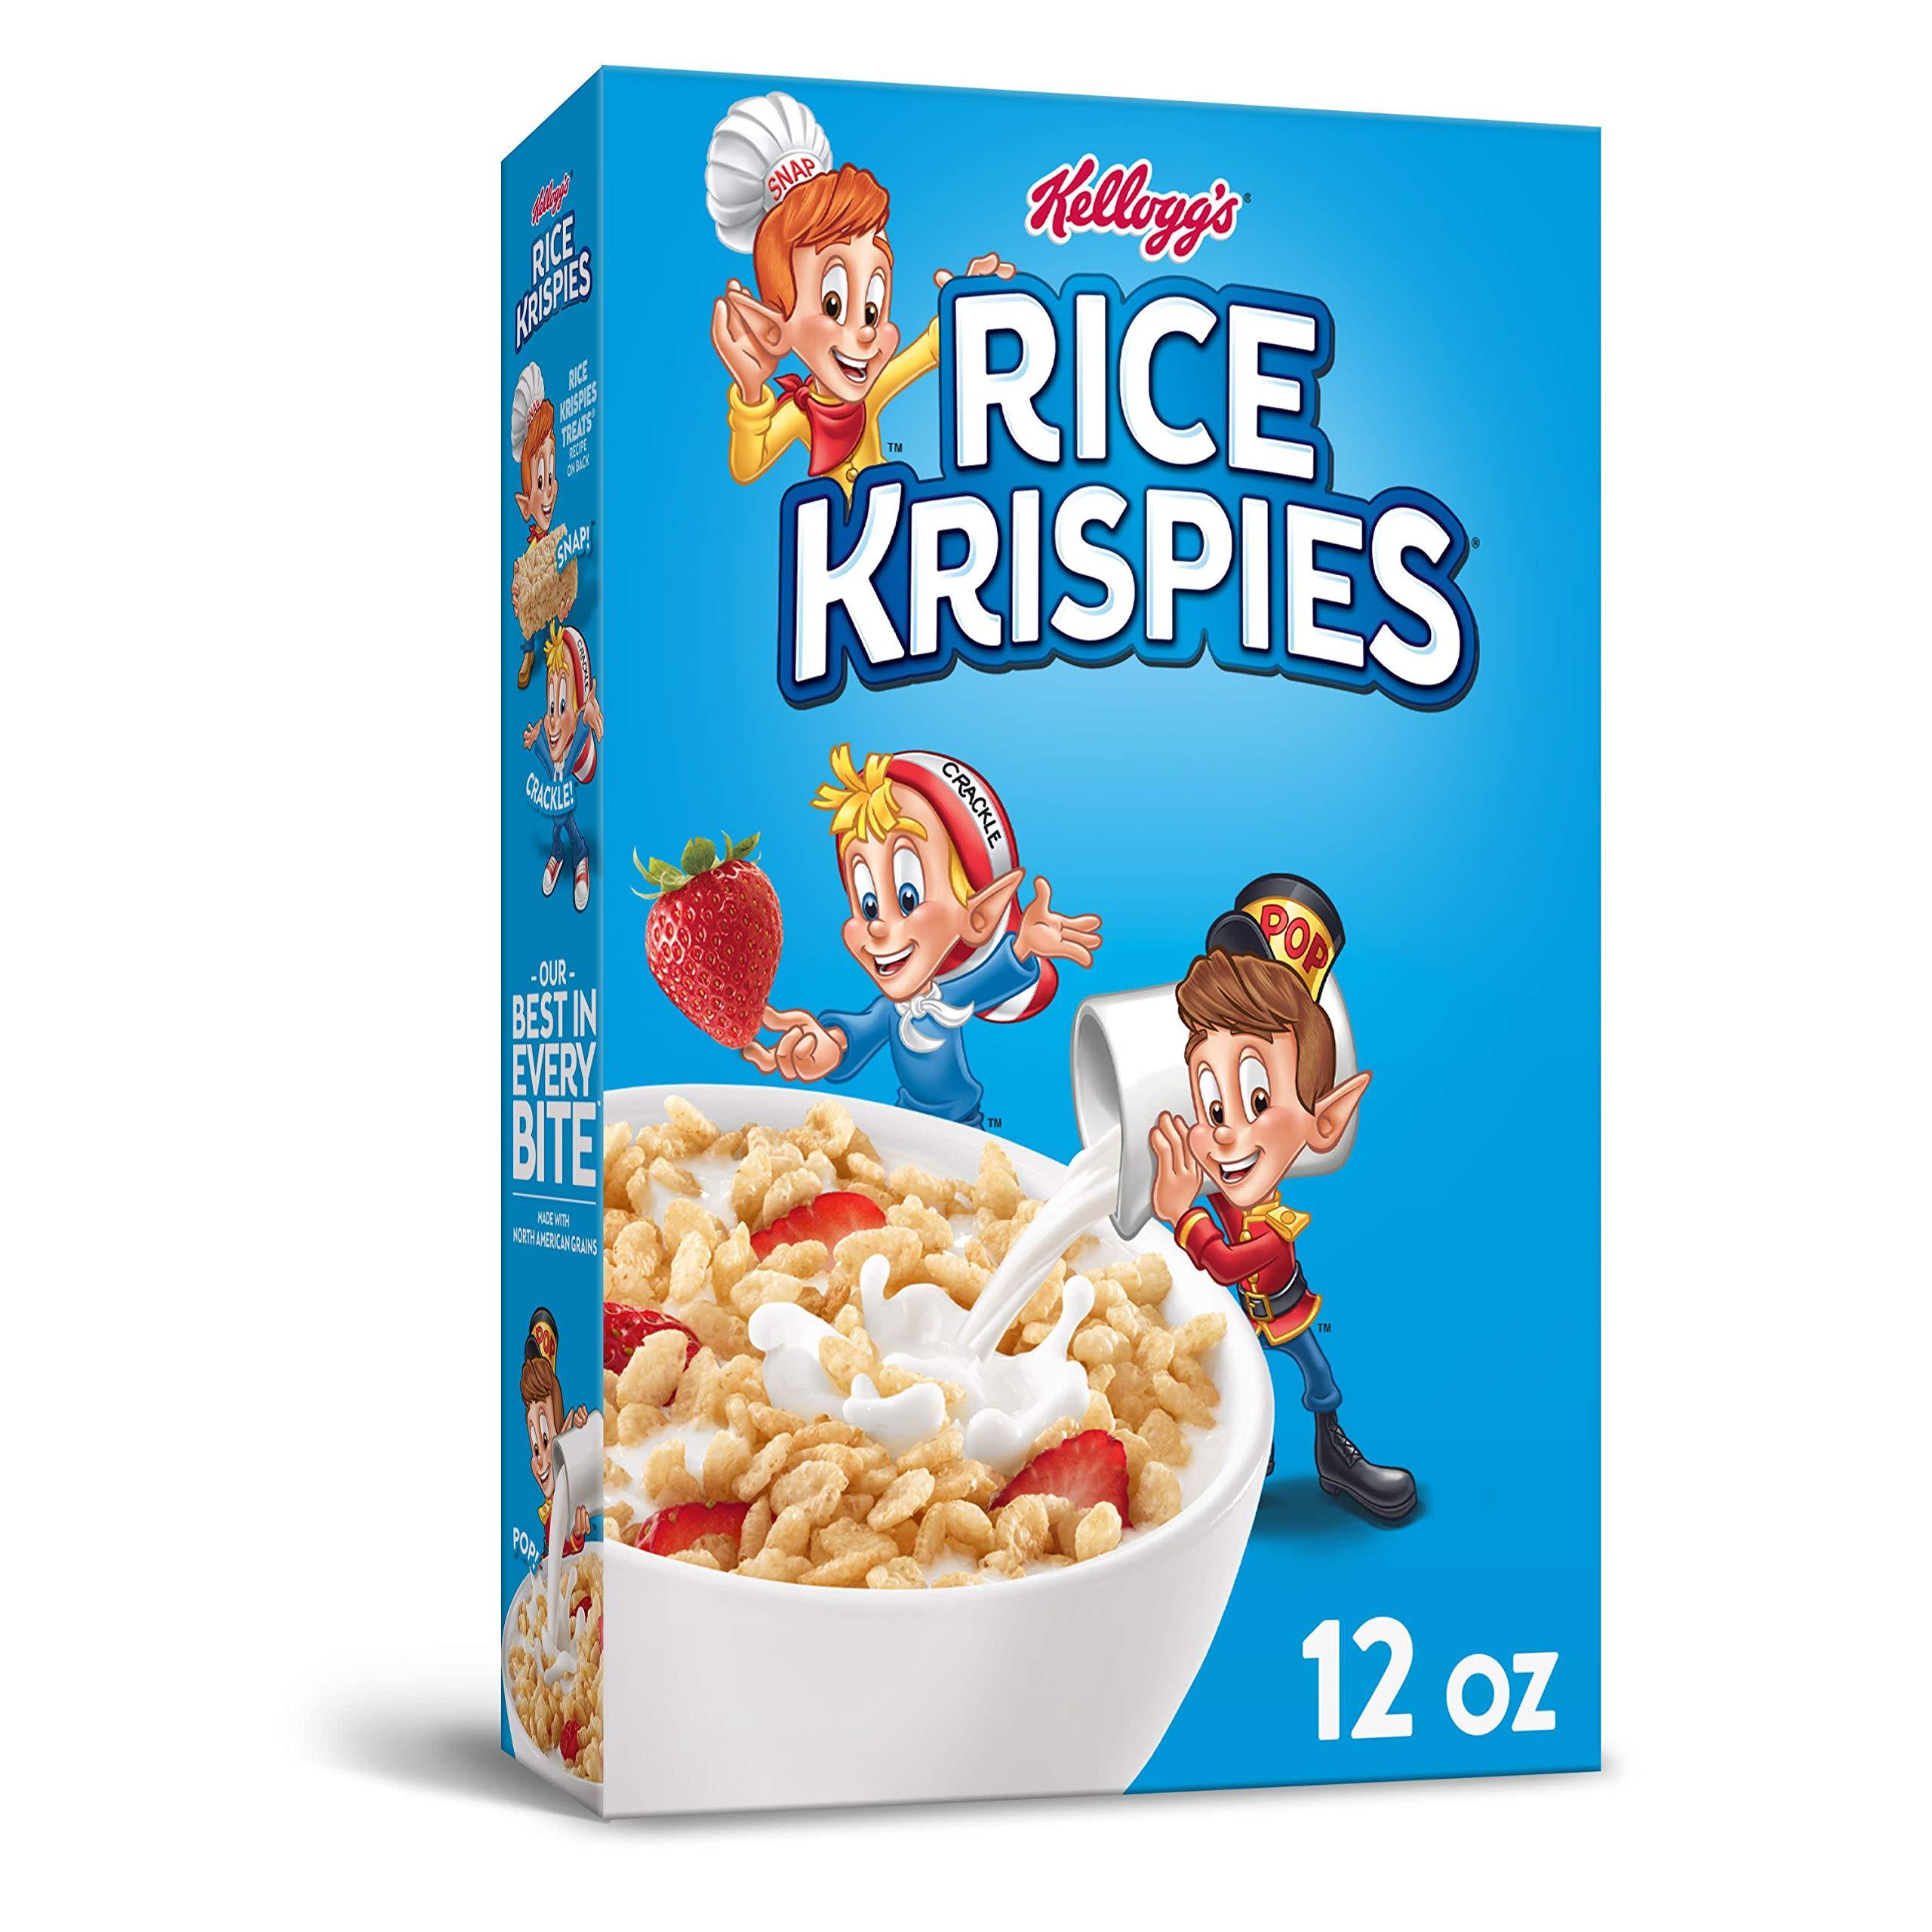 Kellogg's Rice Krispies, Breakfast Cereal, 12oz Box